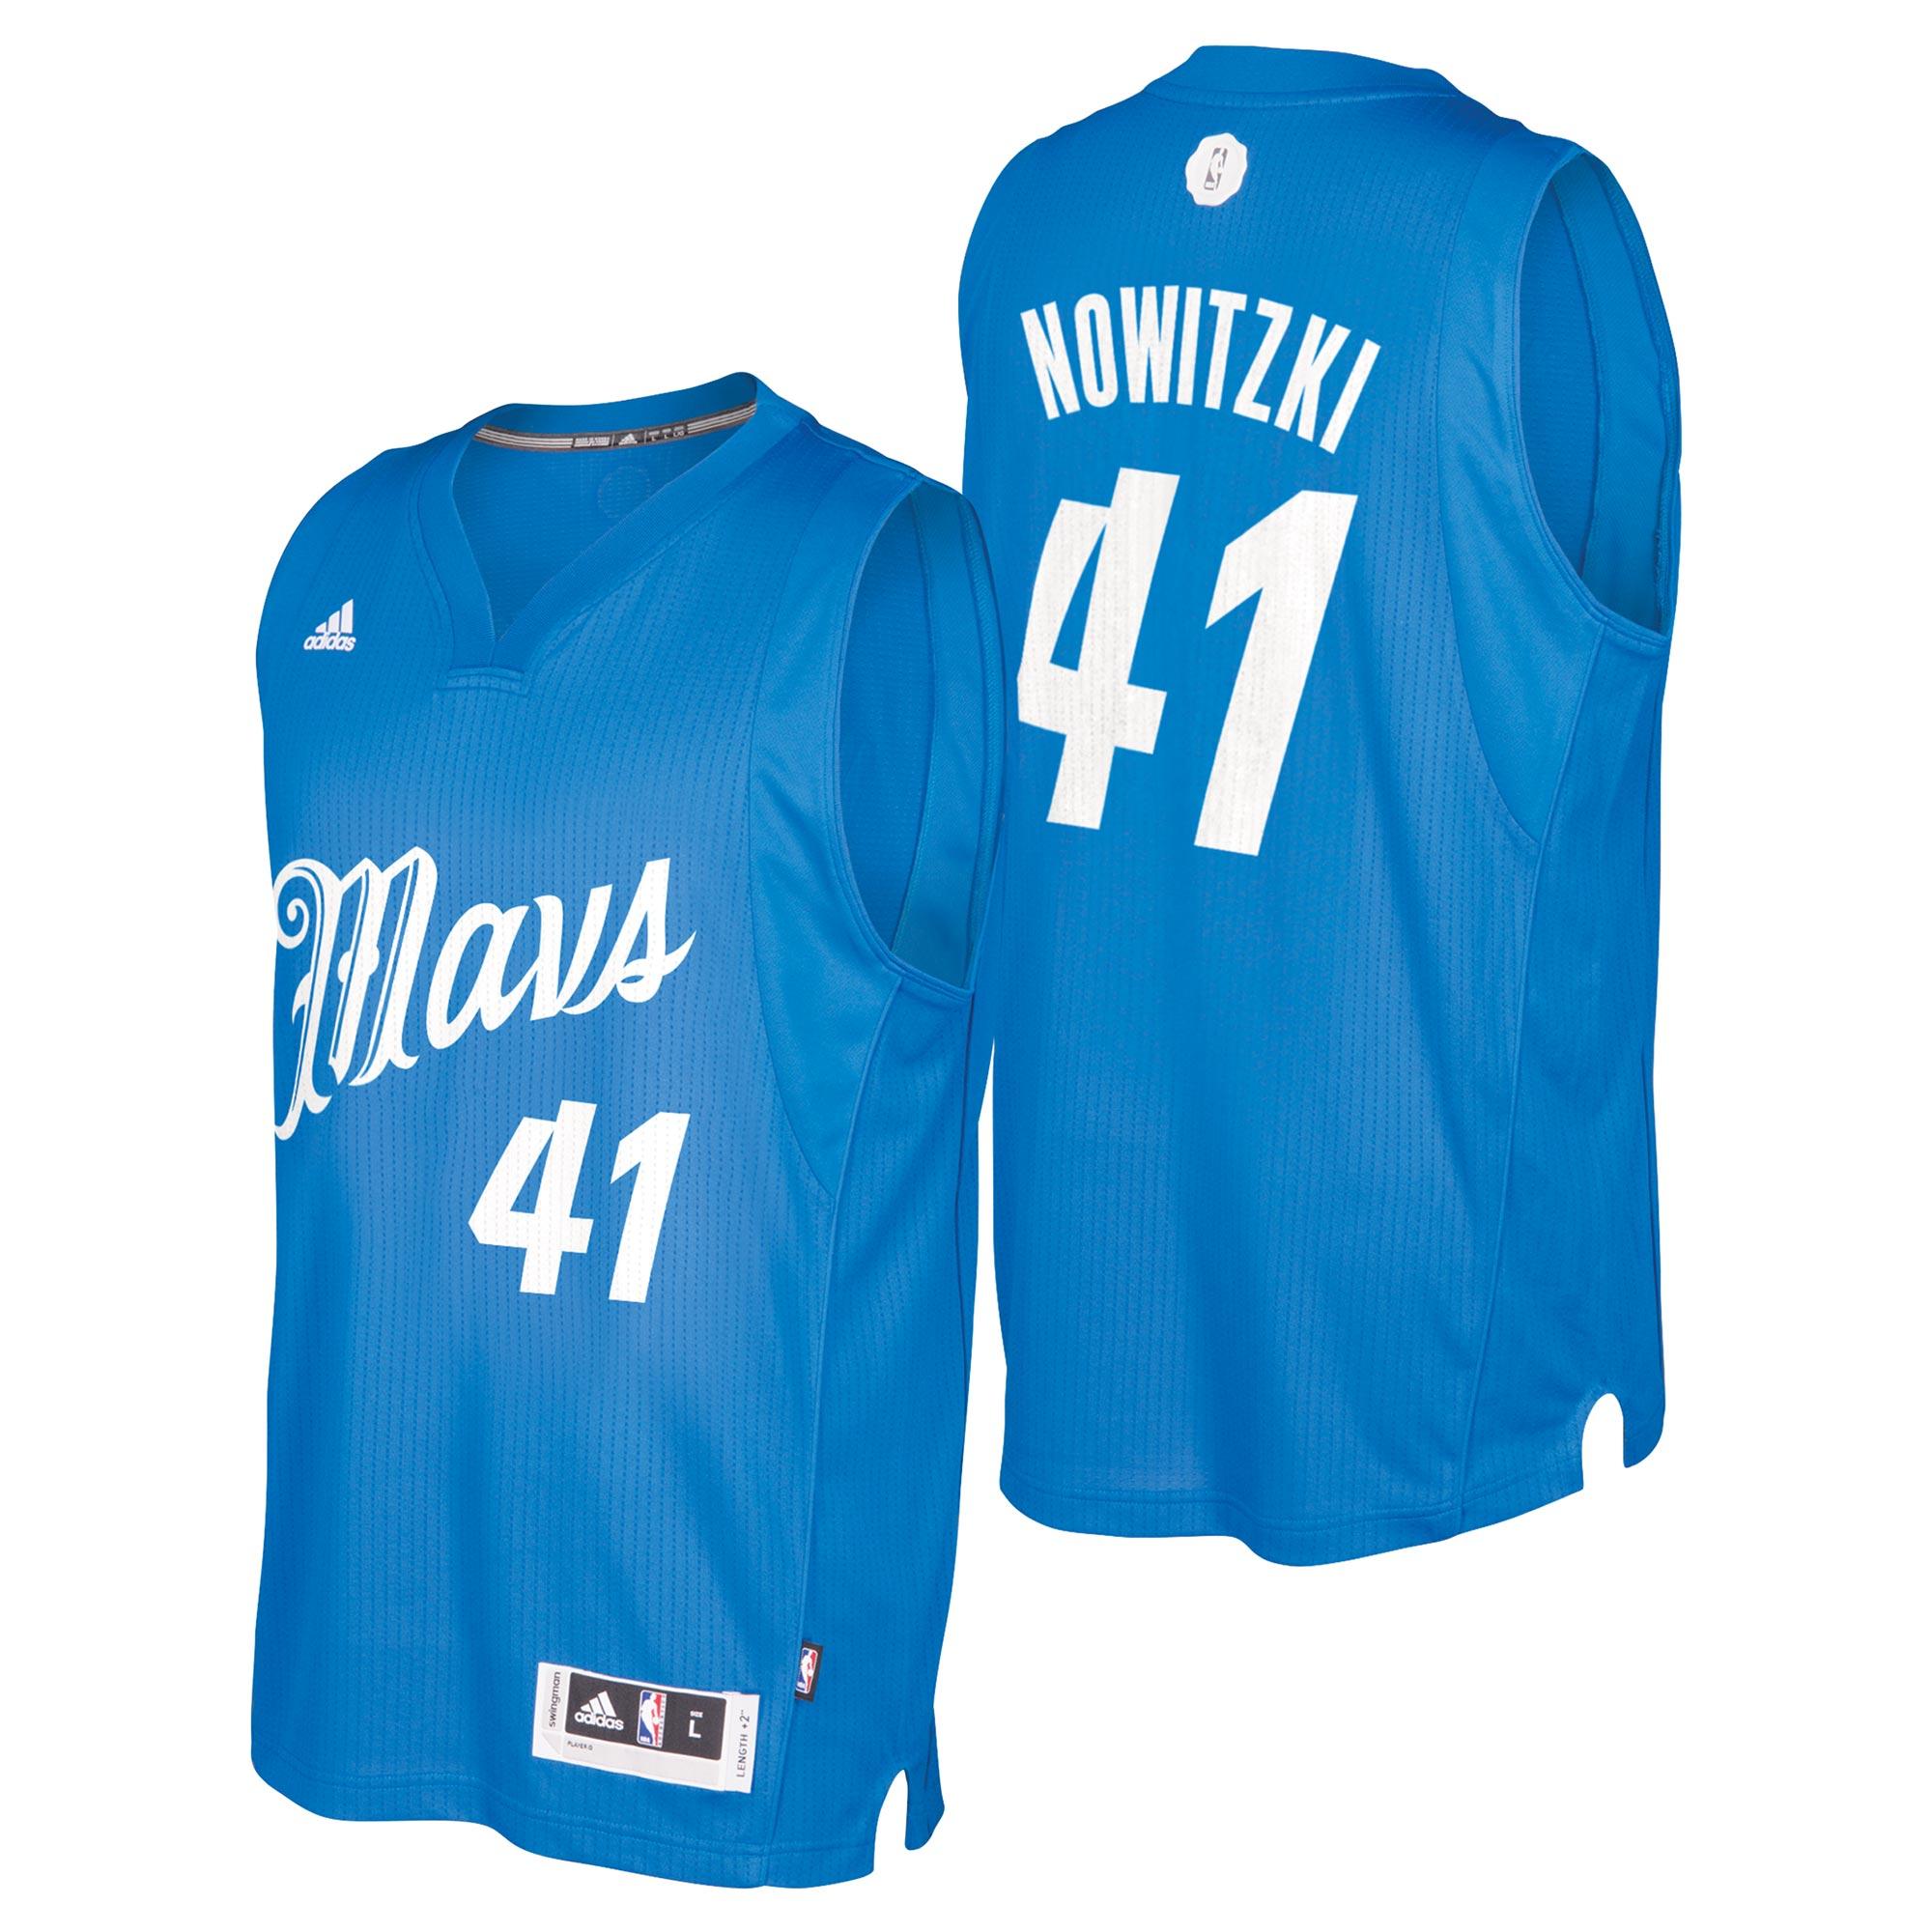 Dallas Mavericks Christmas Day Swingman Jersey 2016 - Dirk Nowizki - M